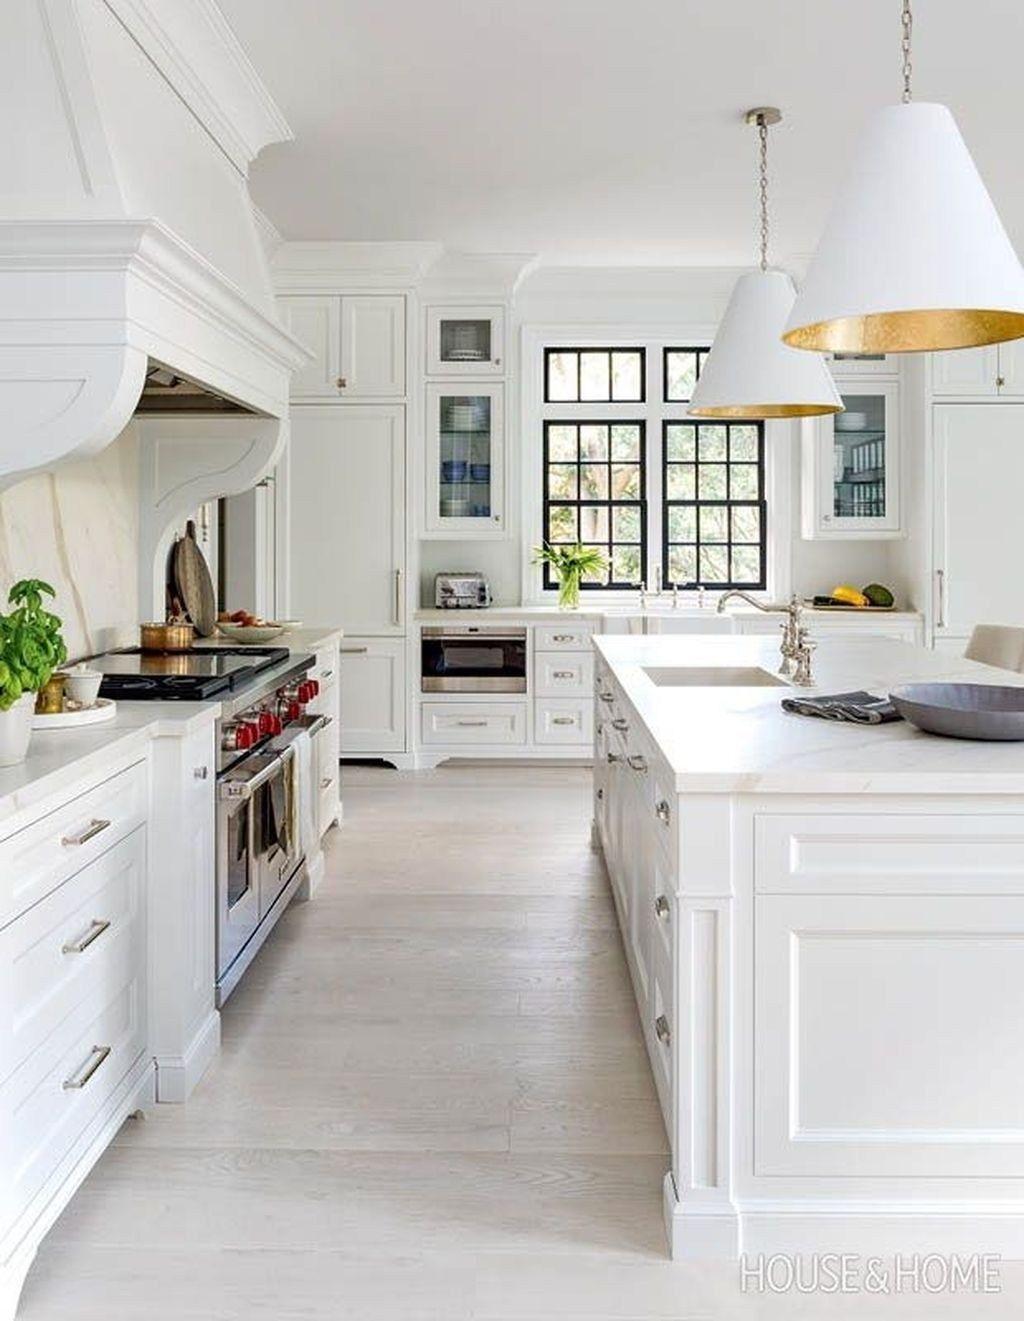 Fancy White Kitchen Design And Décor Ideas That Looks